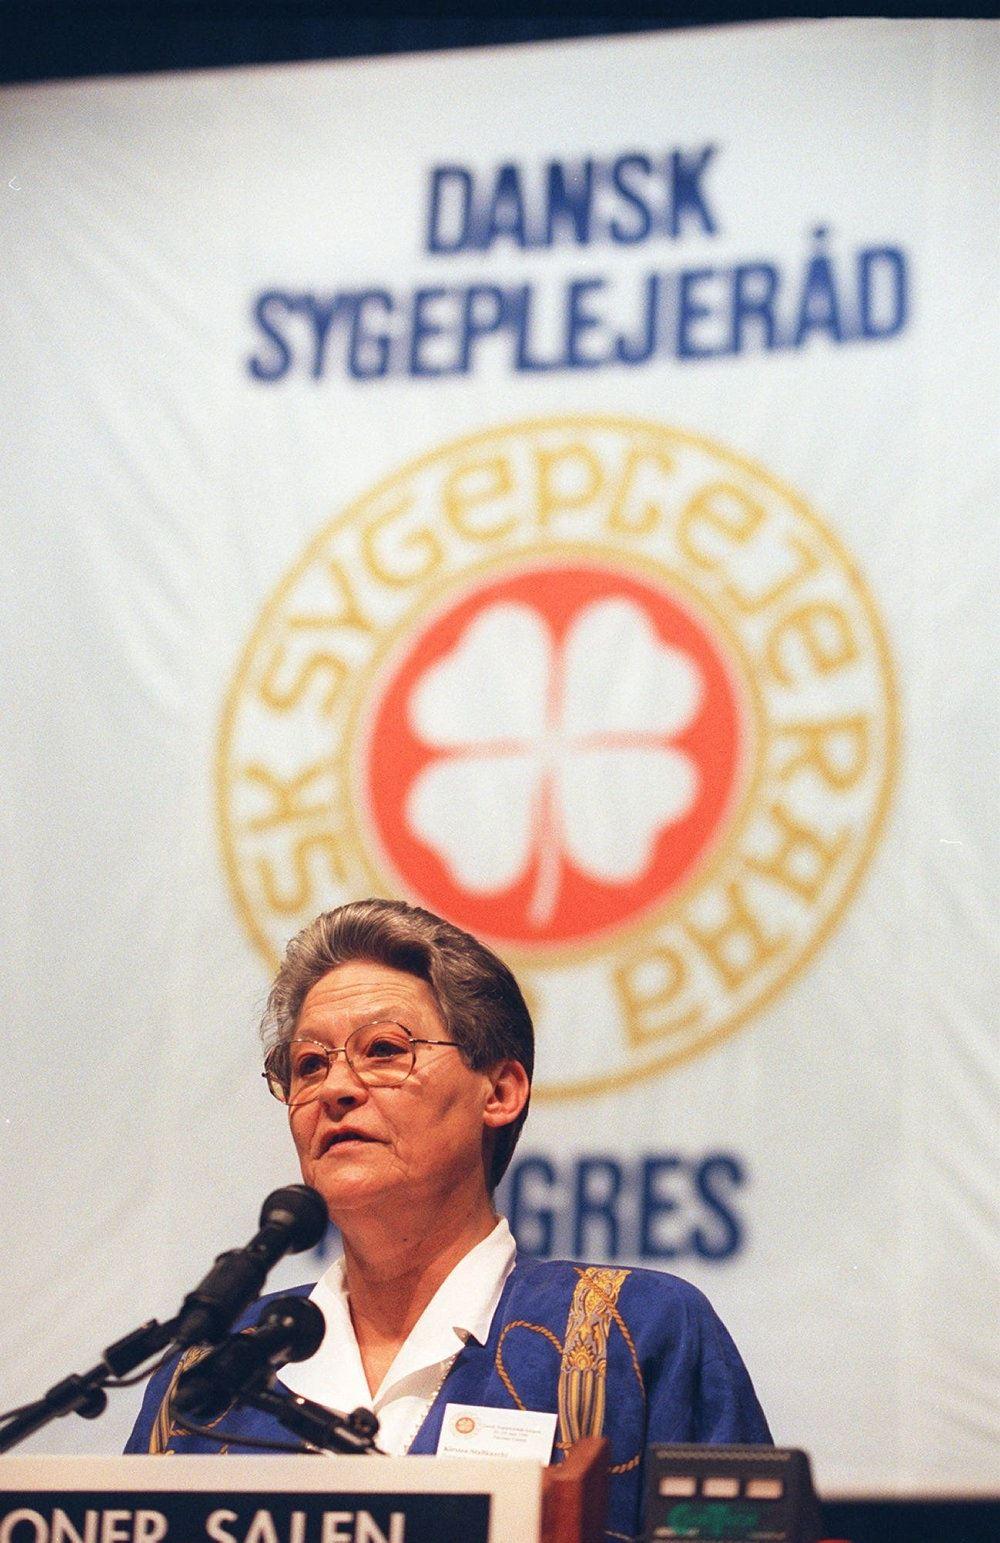 Kirsten Stallknecht står på talerstol ved kongres